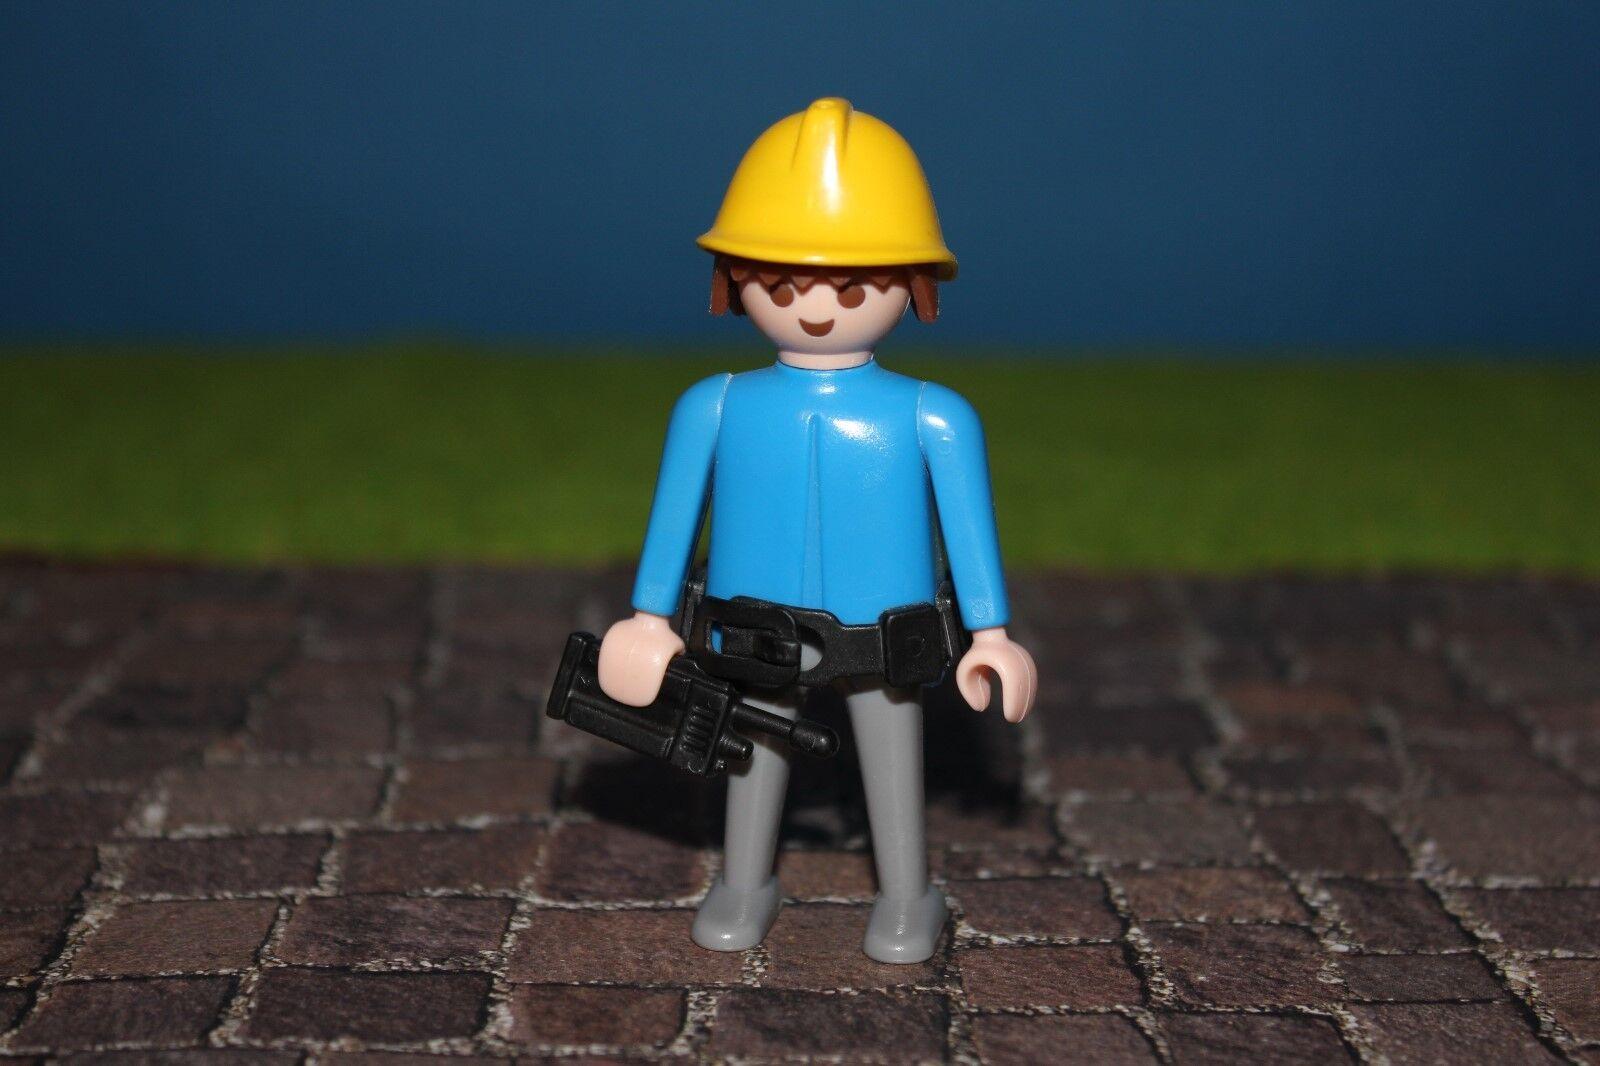 Playmobil THW Jugend Promo Werbefigur